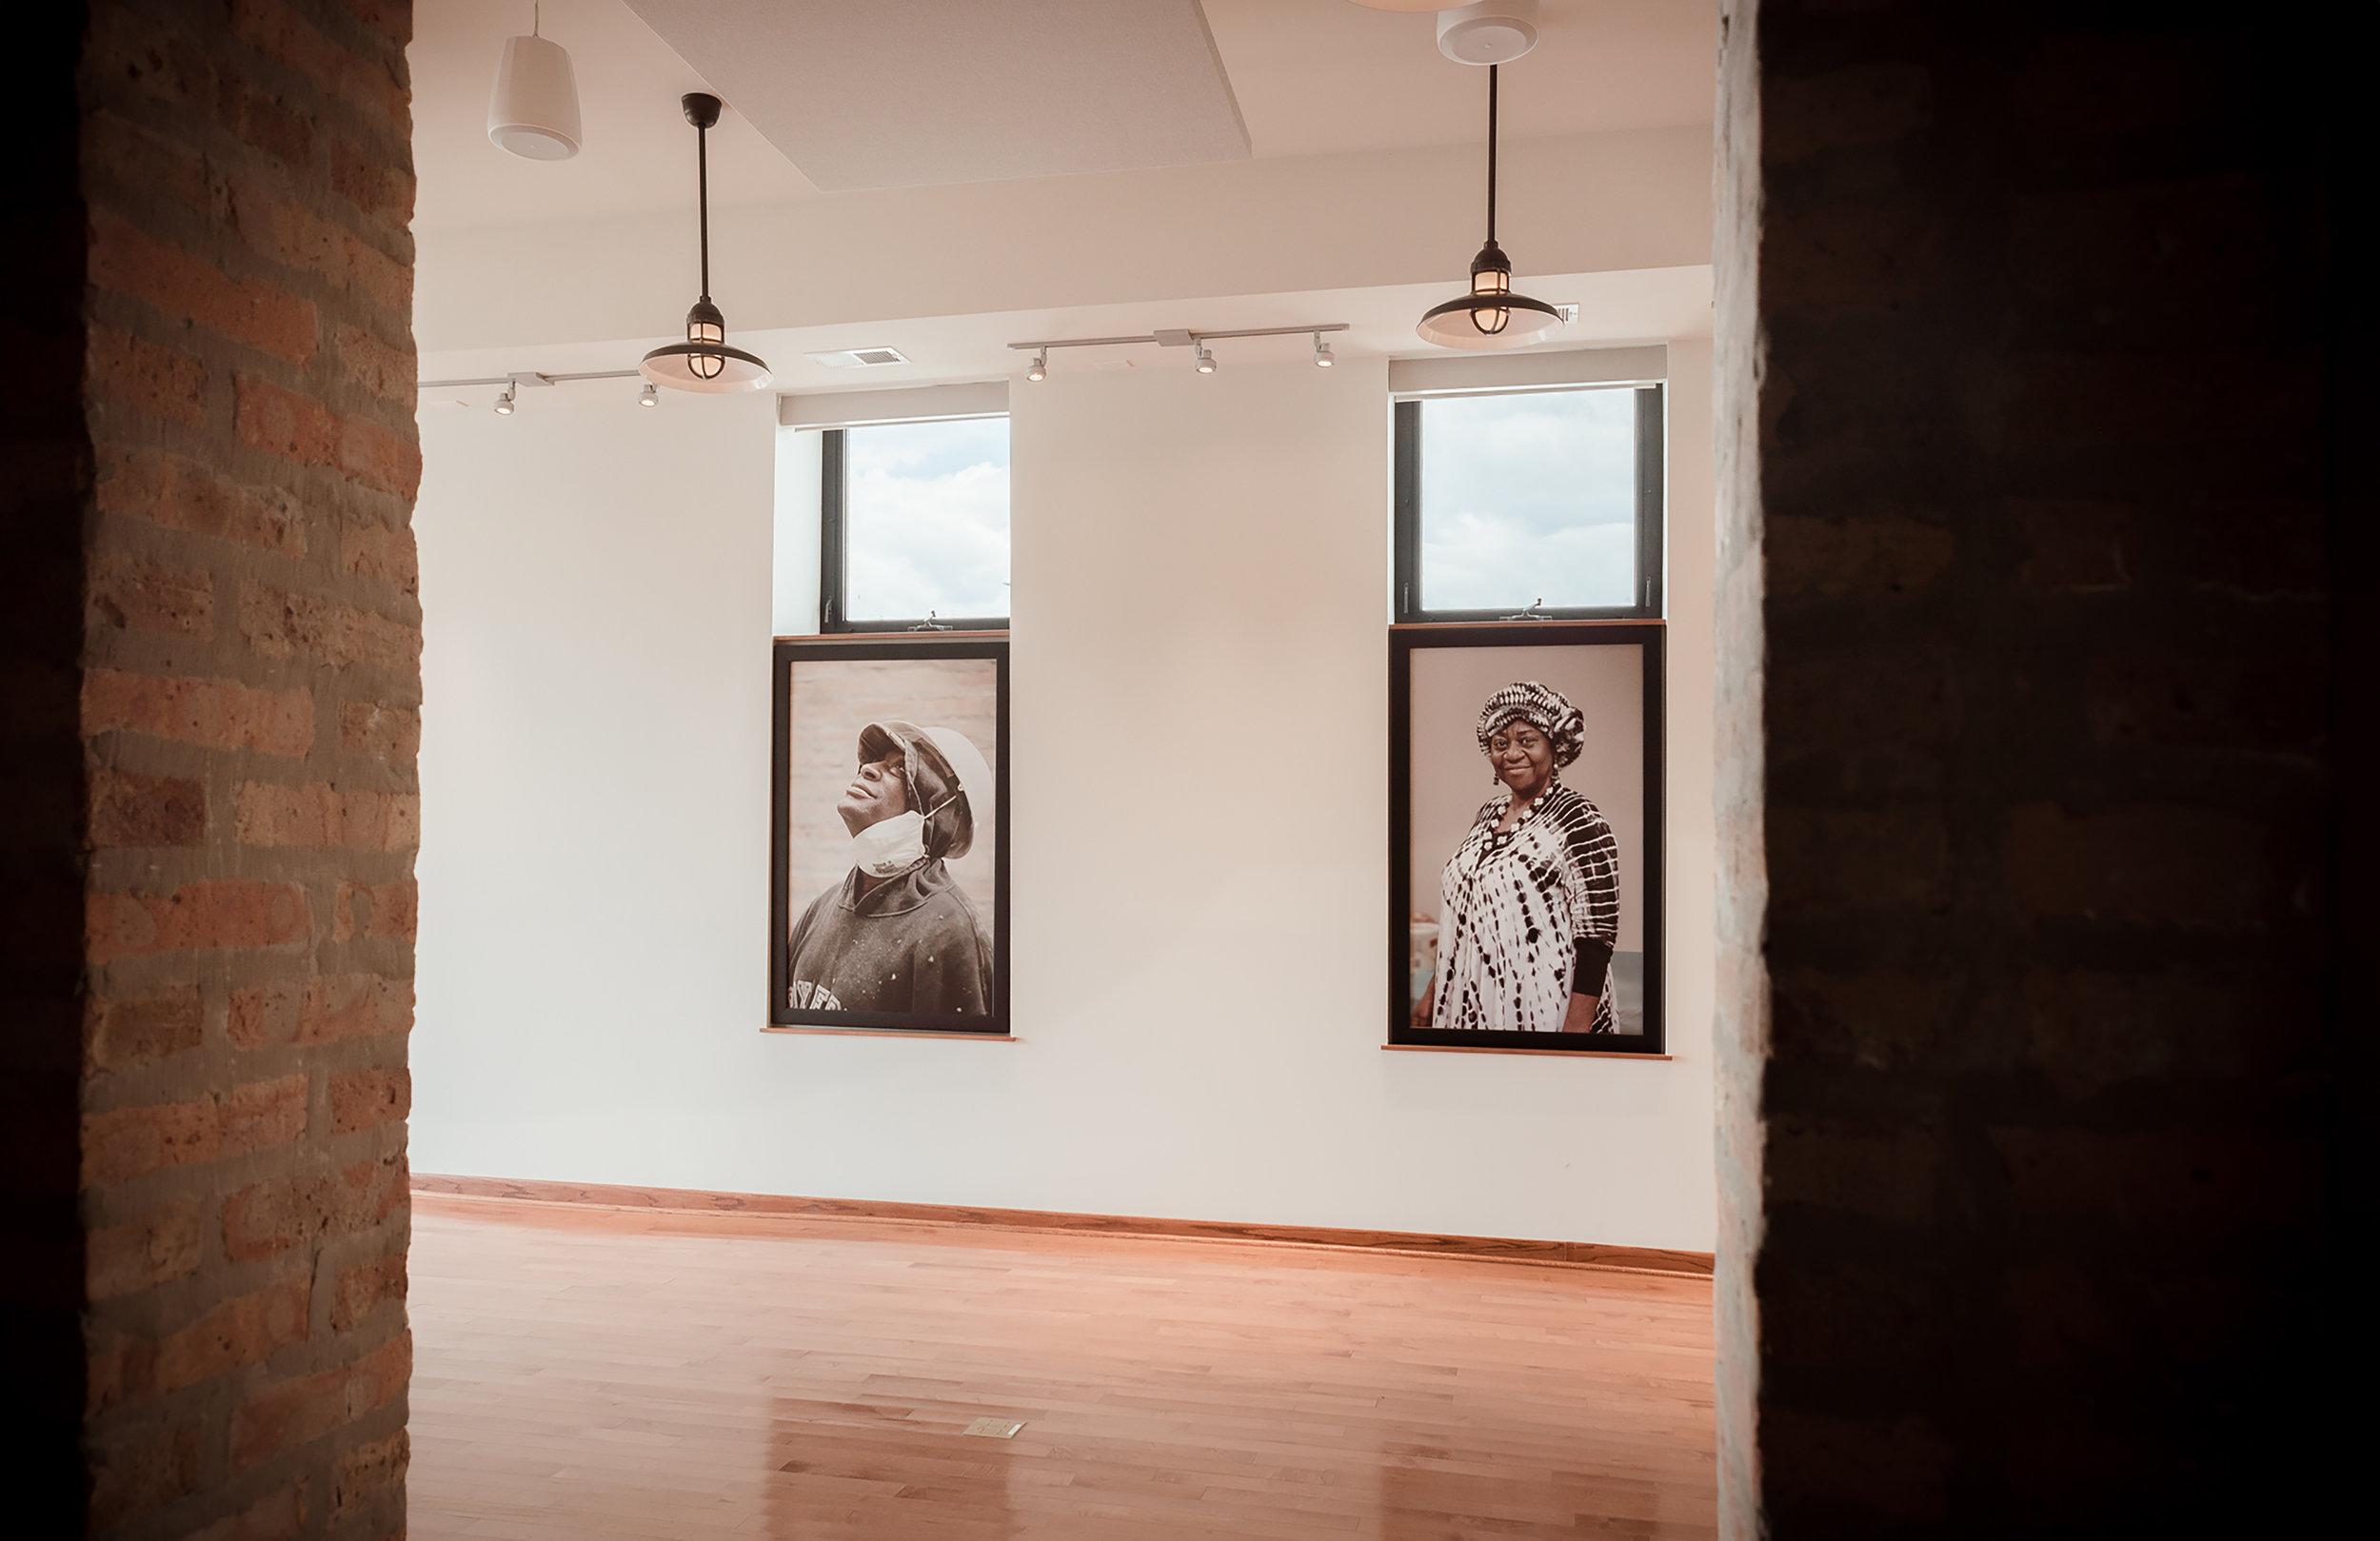 gallery_inside_1st_floor.jpg